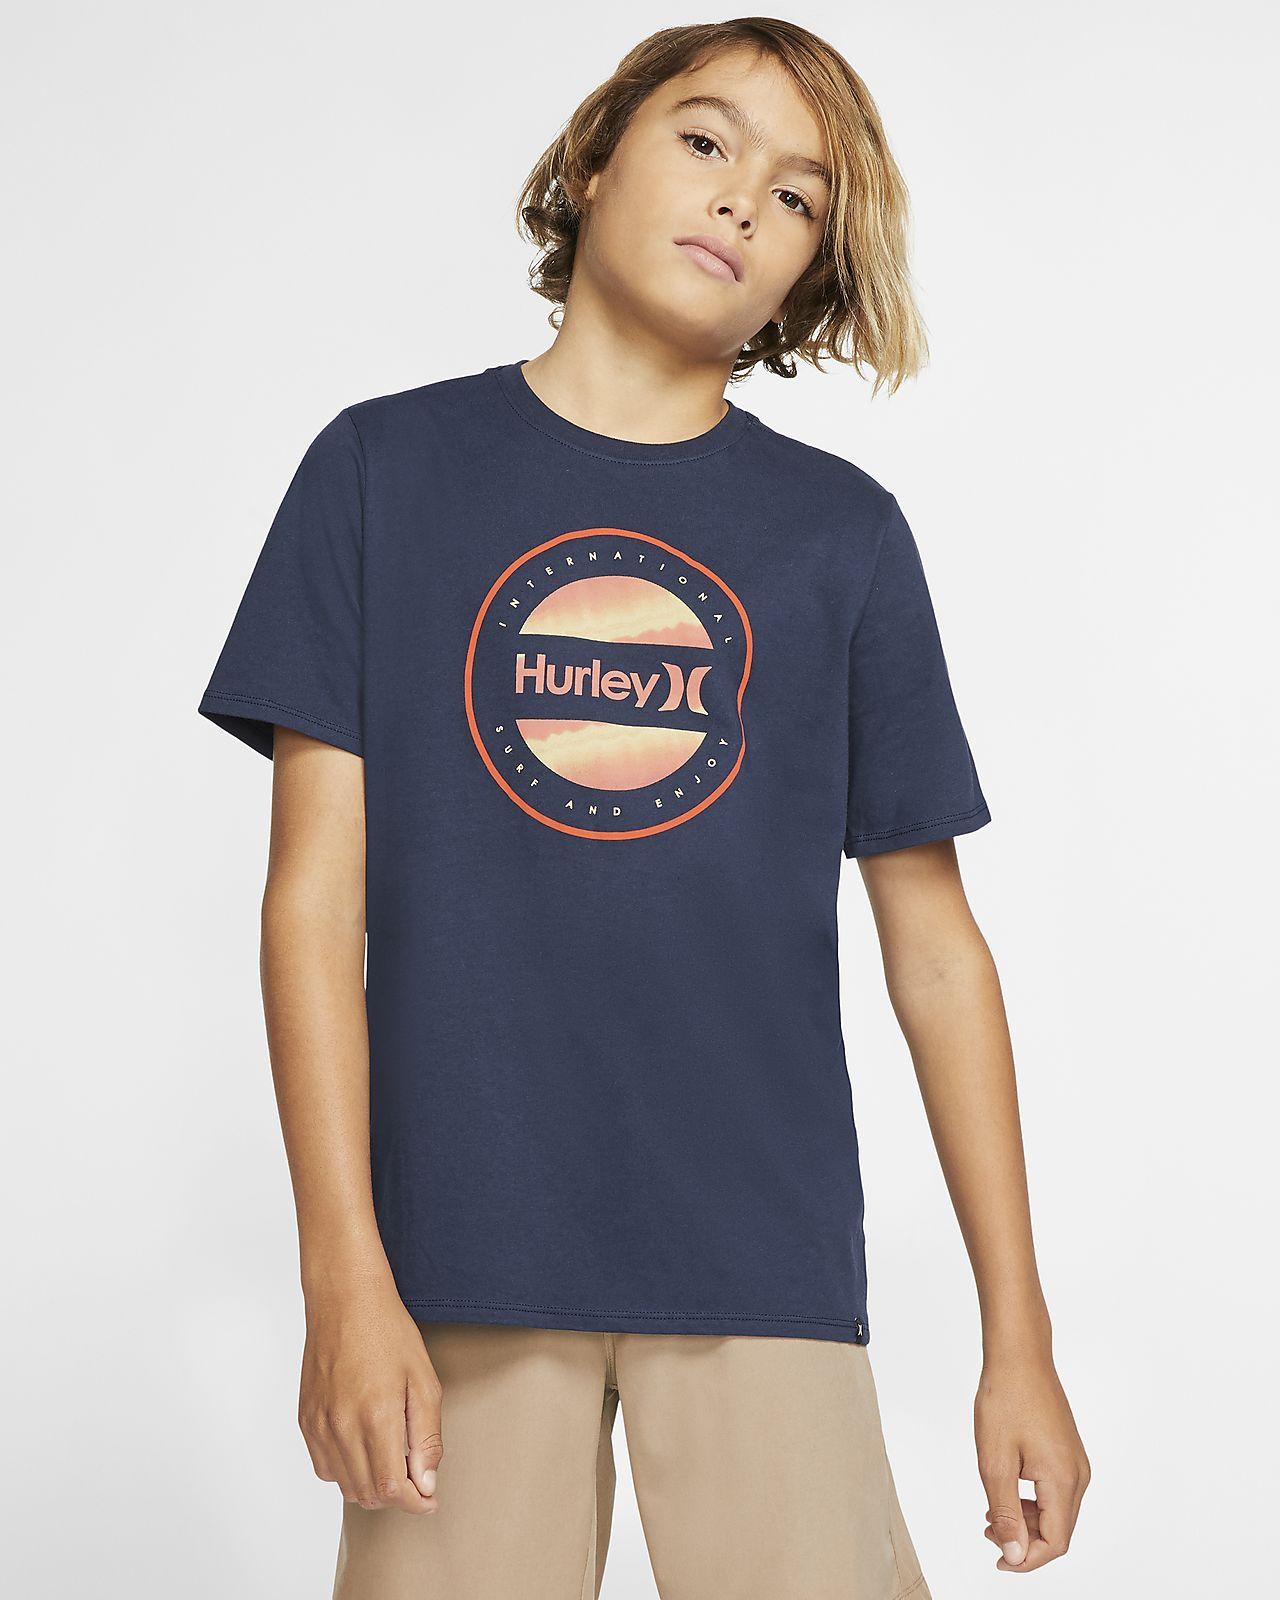 Hurley Premium Circle Dye Logo Boys' T-Shirt